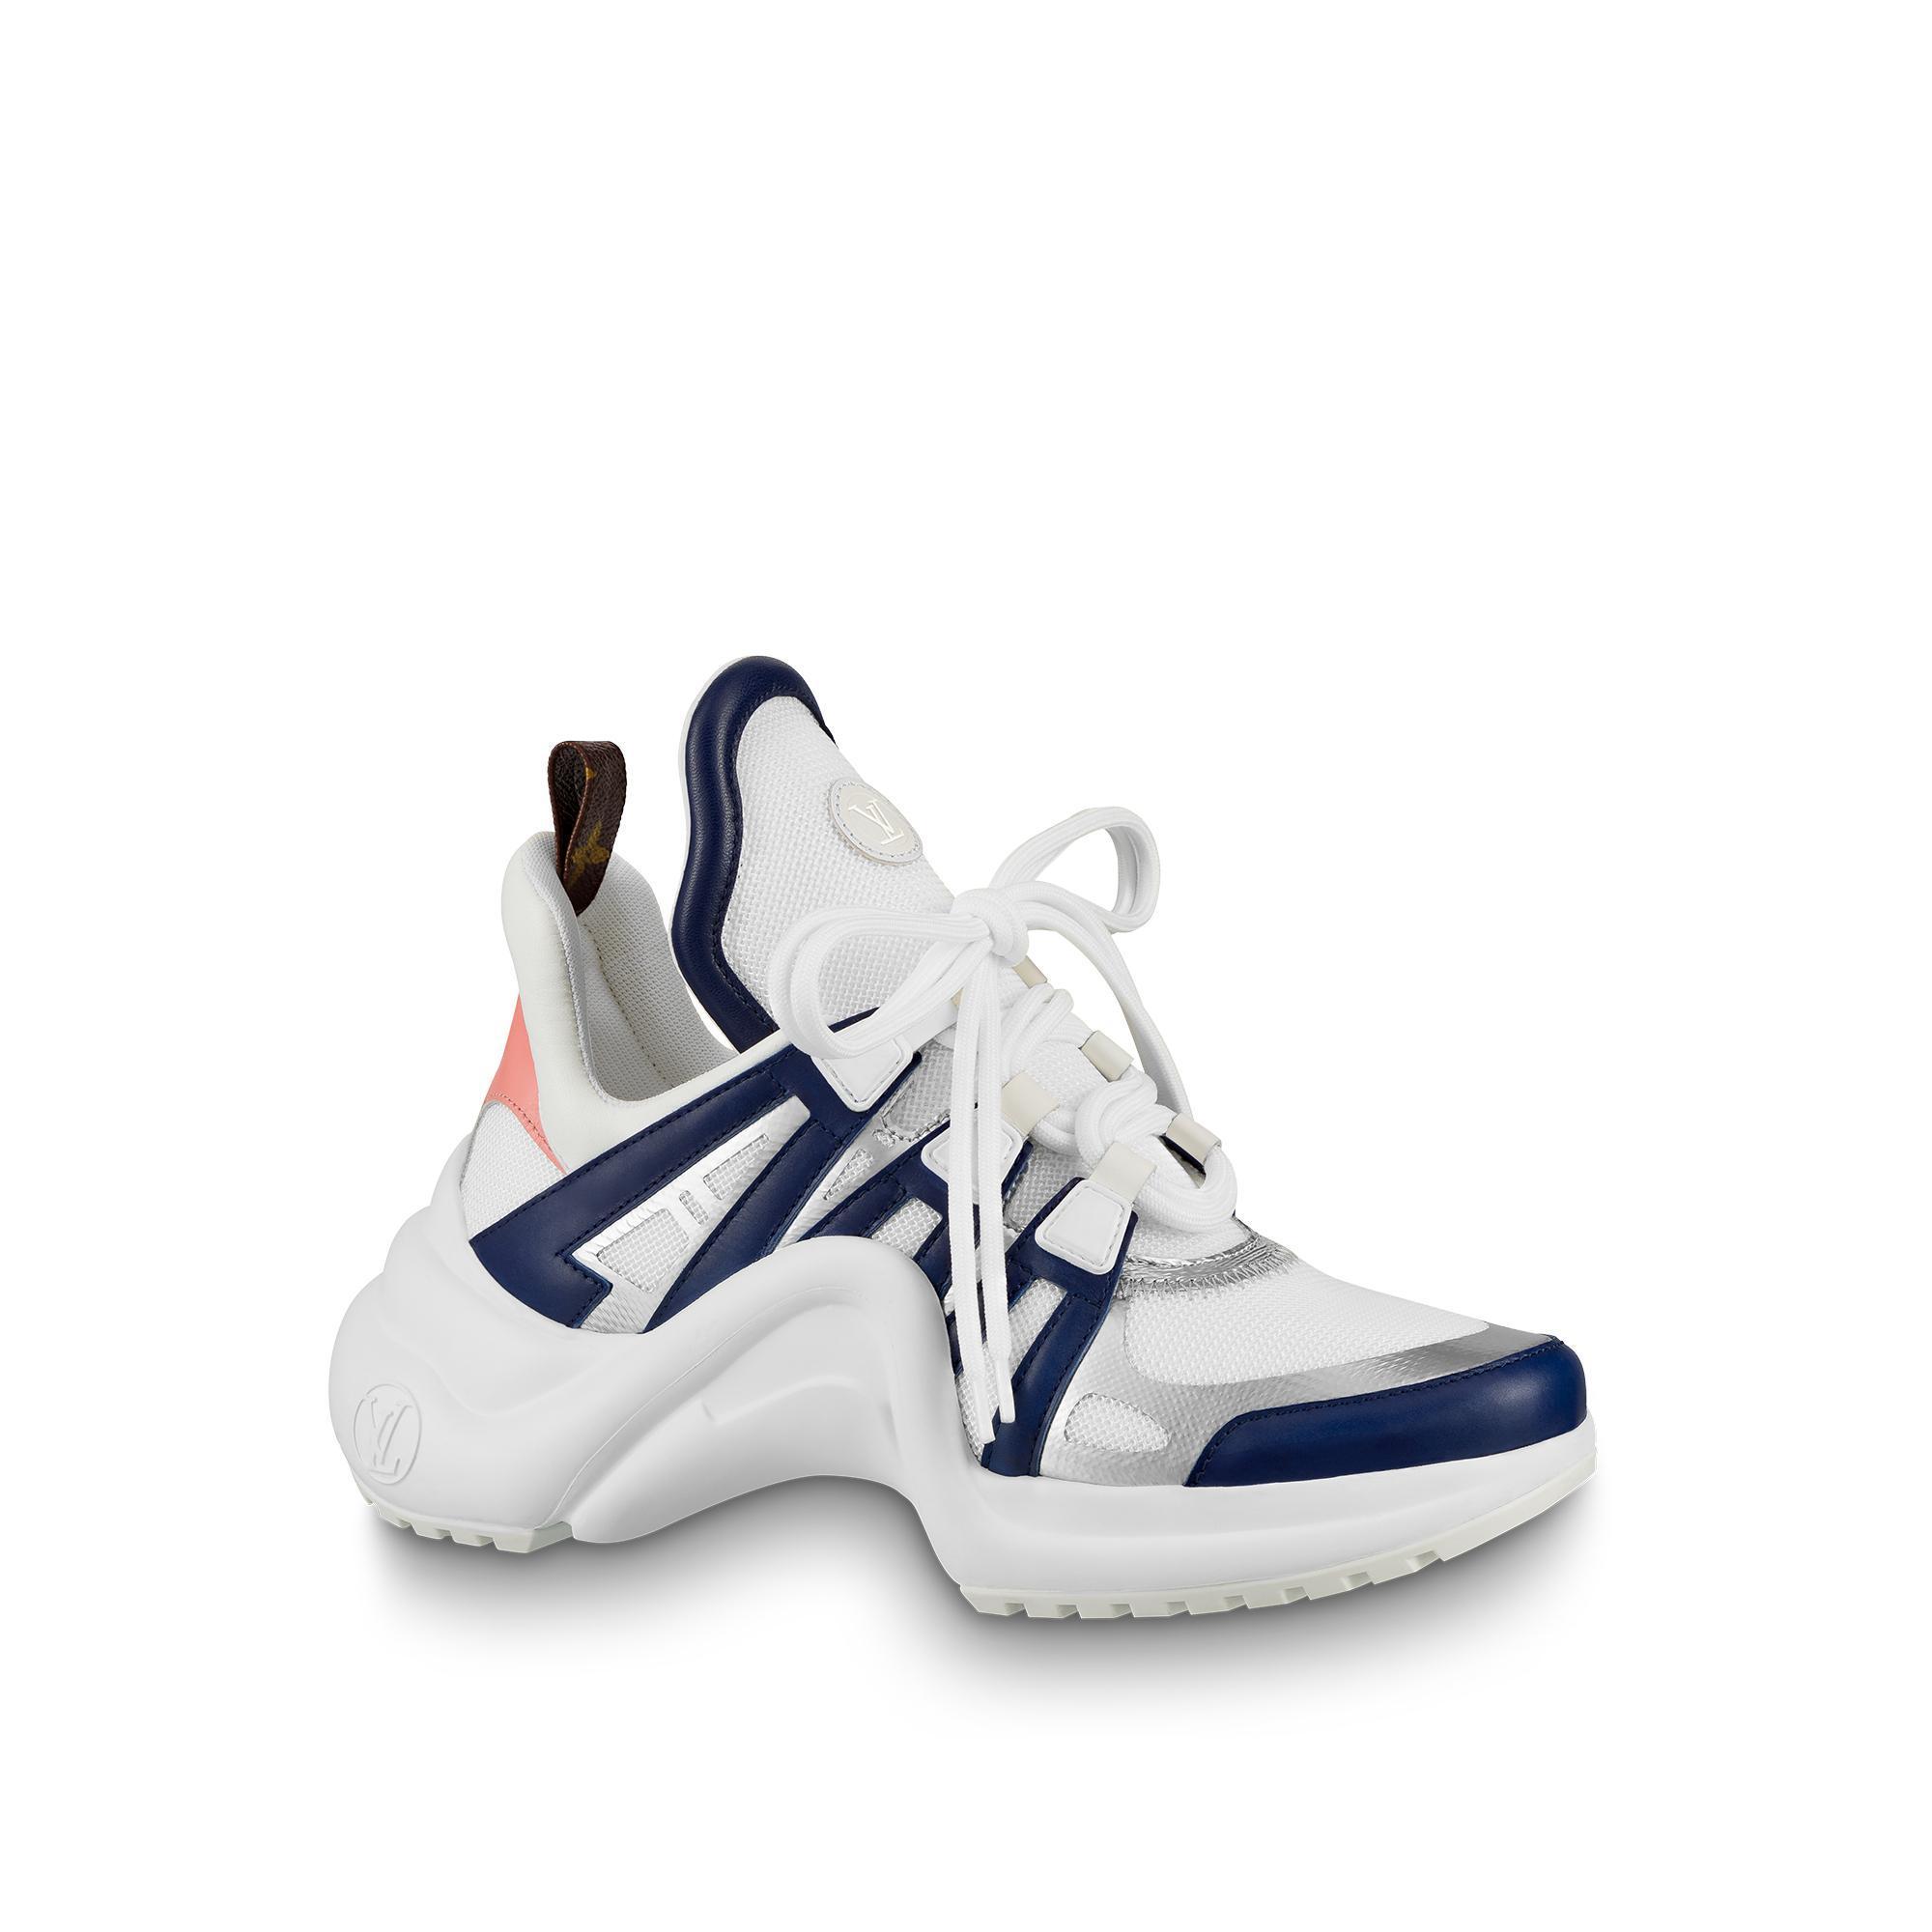 82a8dbe2d88d Louis Vuitton Lv Archlight Sneaker In Silver